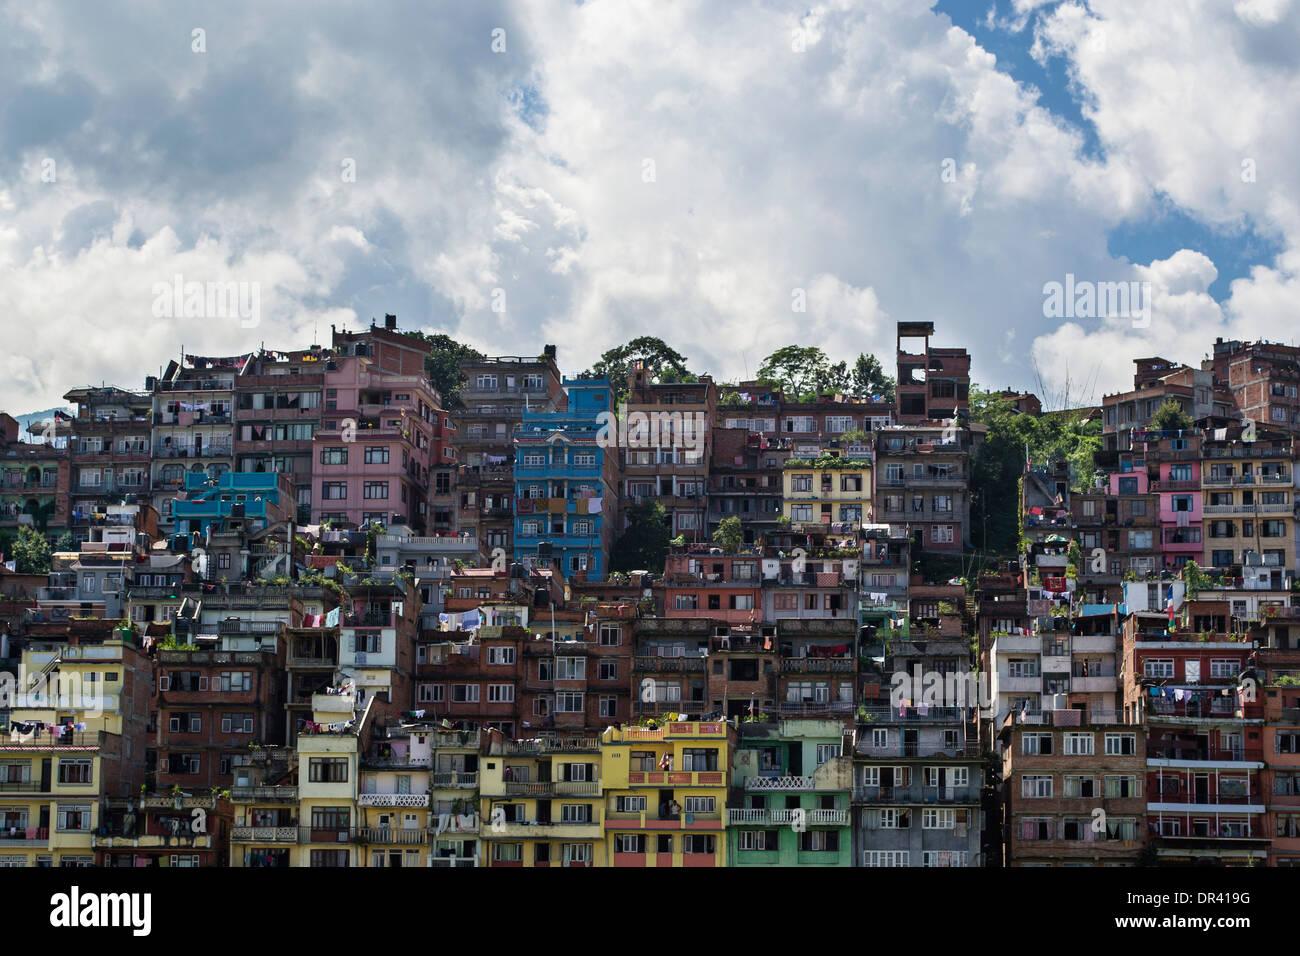 Houses in Kathmandu - Stock Image